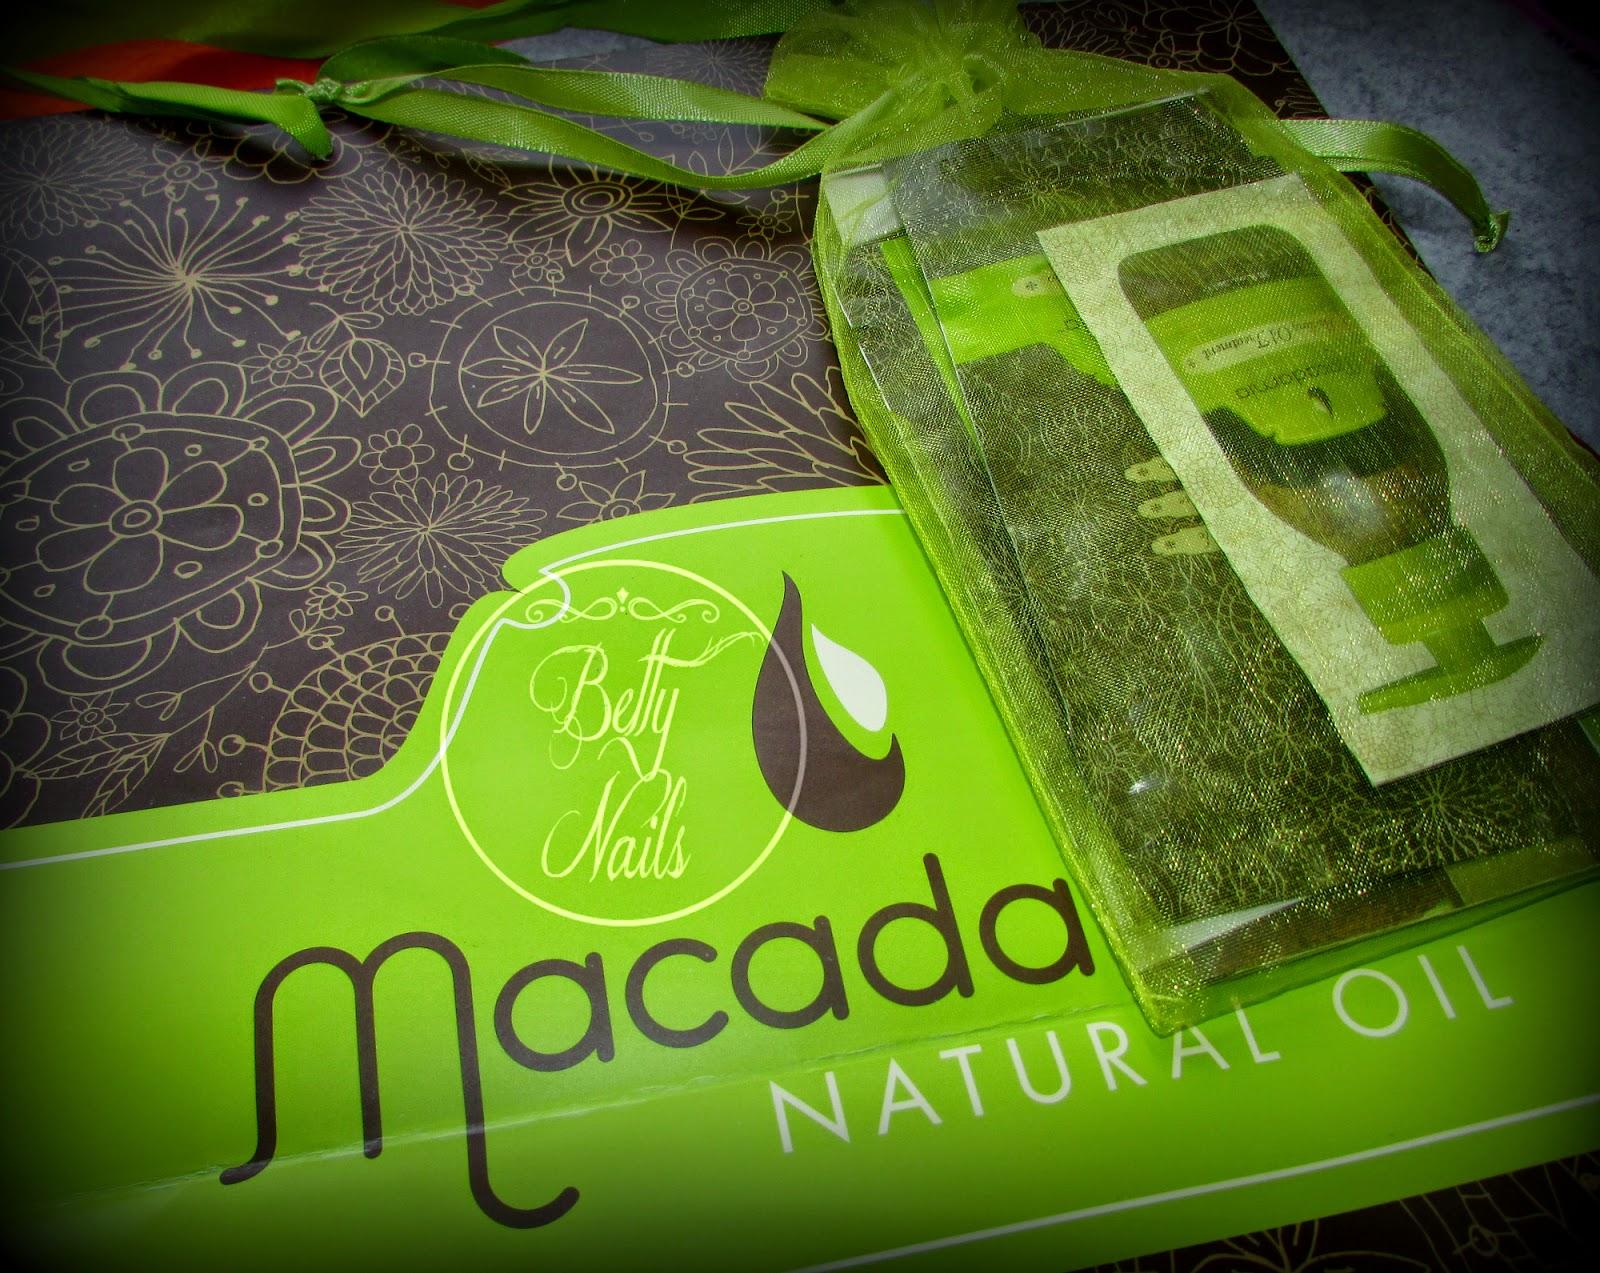 Macadamia Natural Oil Healing Oil Treatment Vs Spray